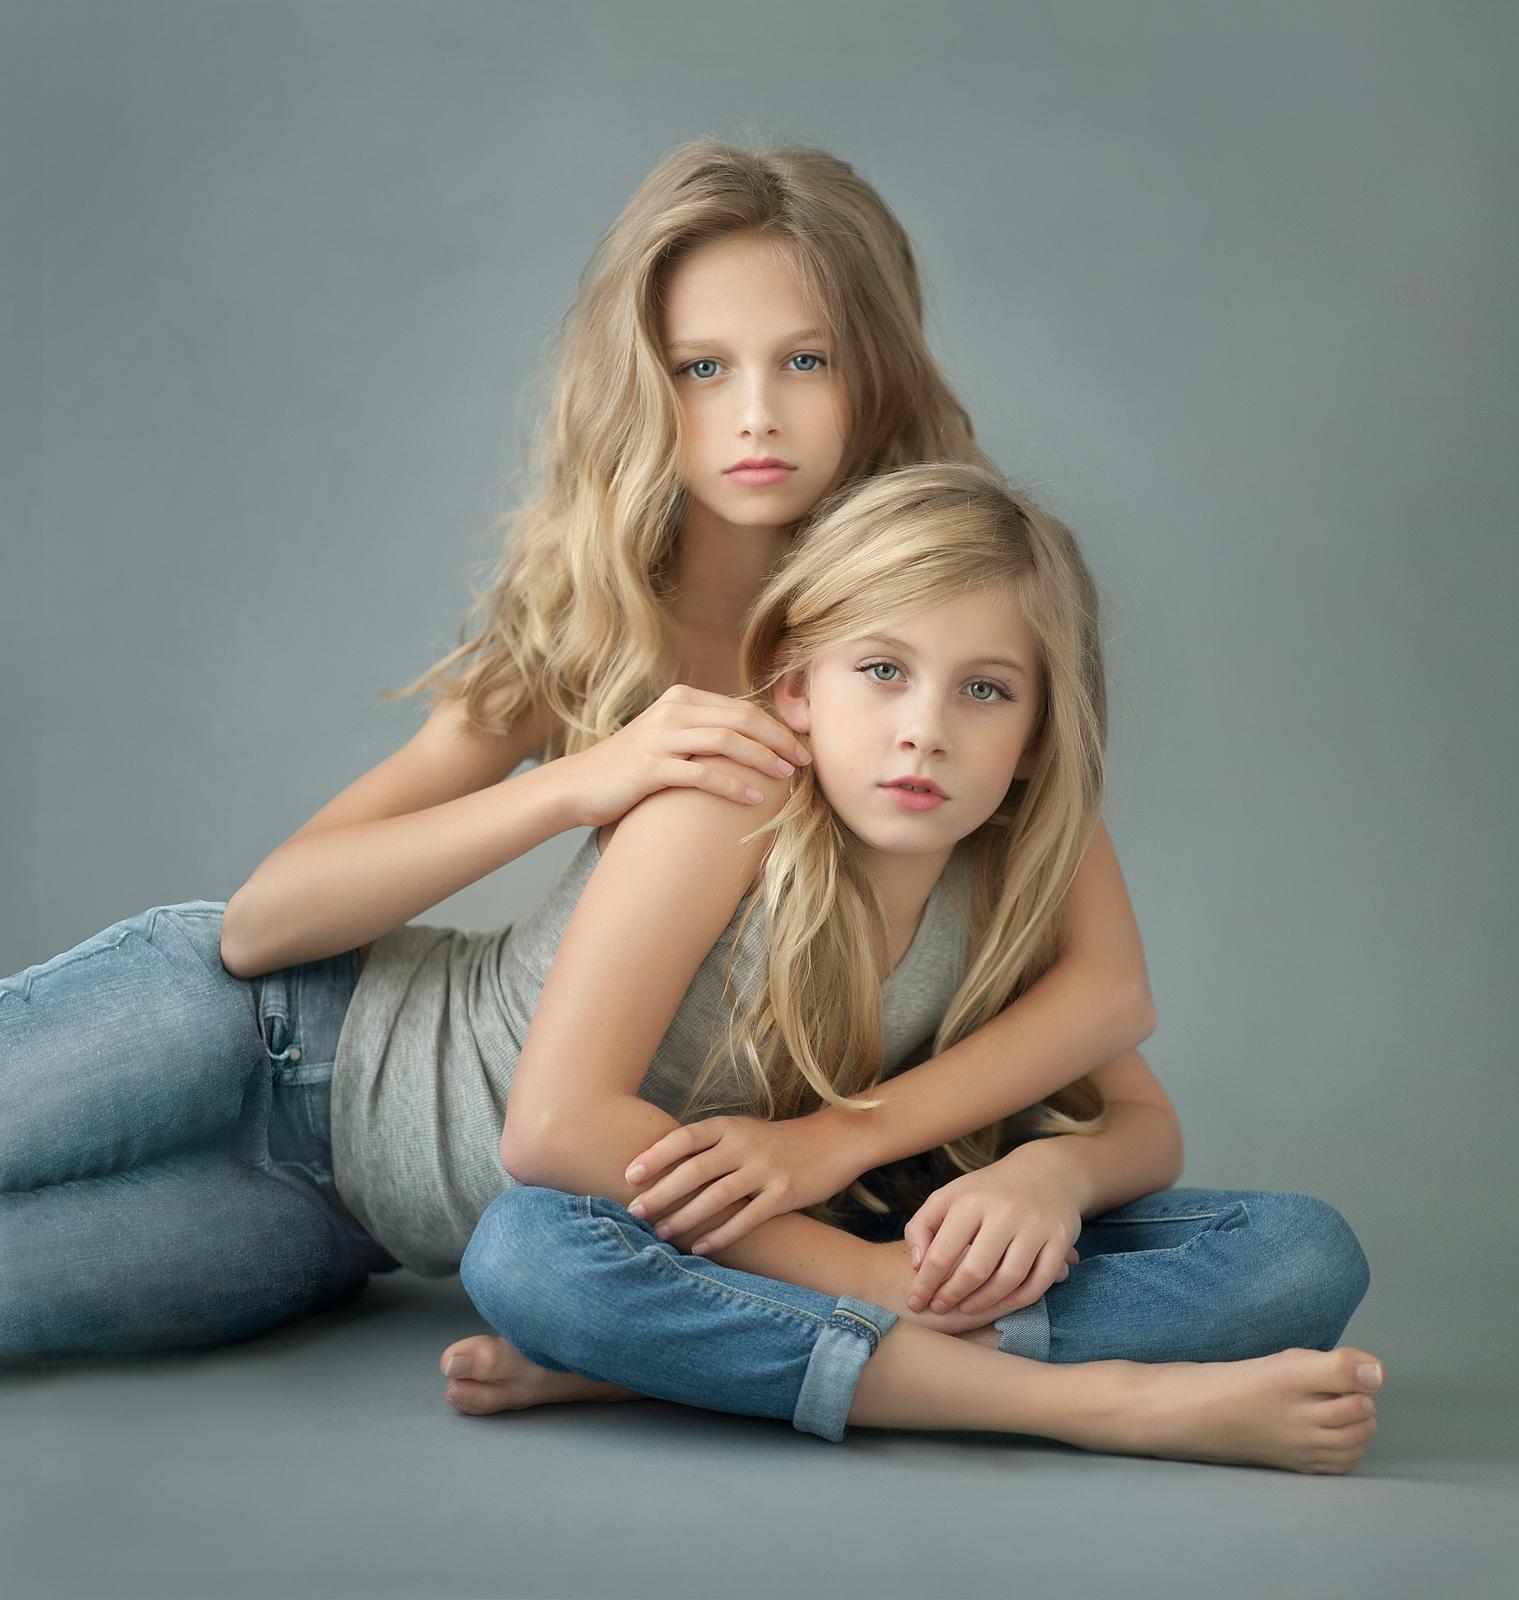 13-gorgeous-young-girls-model-pose-long-hair.jpg